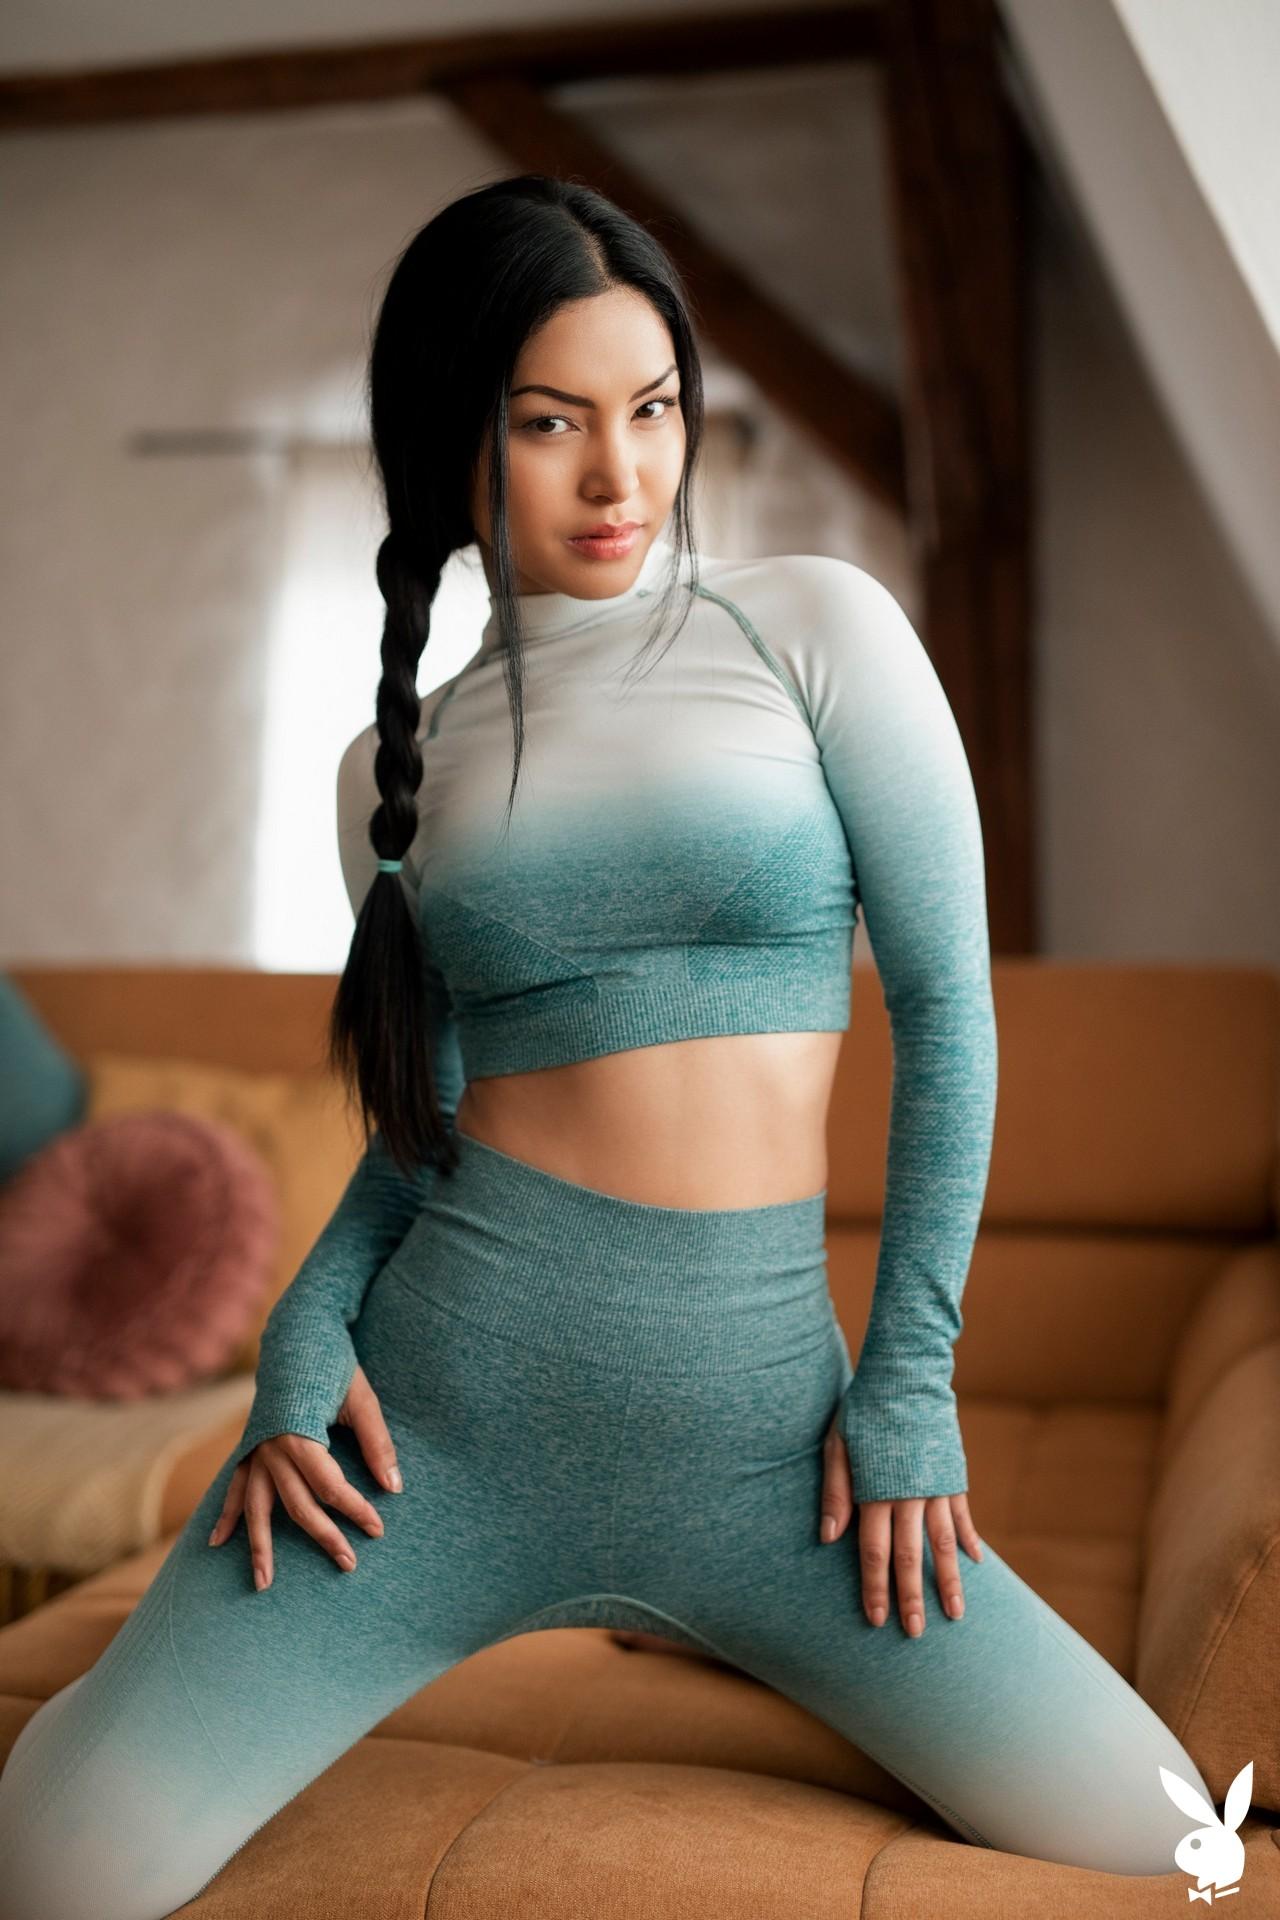 Chloe Rose In Feeling Energized Playboy Plus (5)